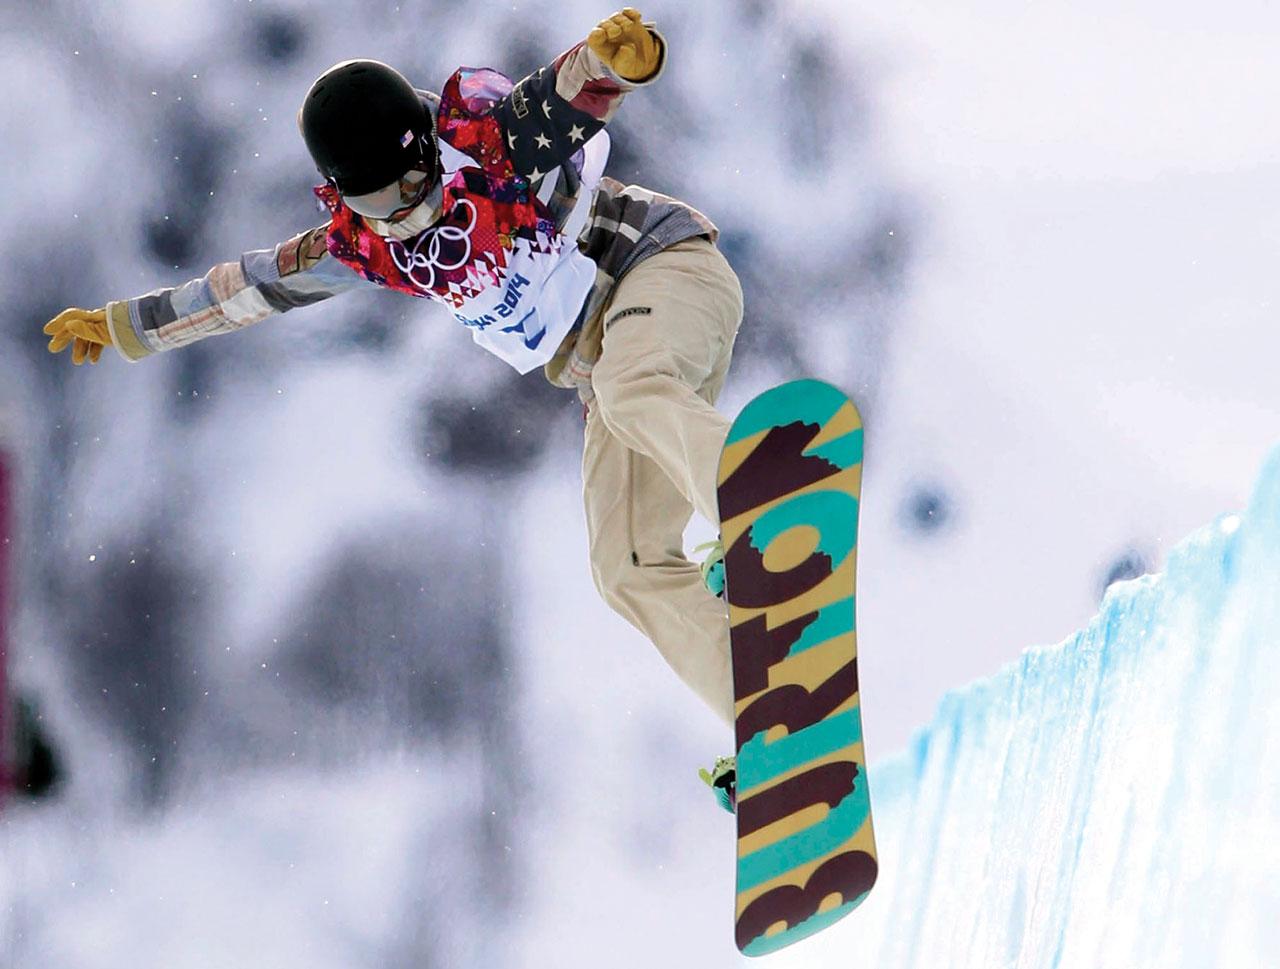 Snowboarder seeks to inspire beyond Sochi